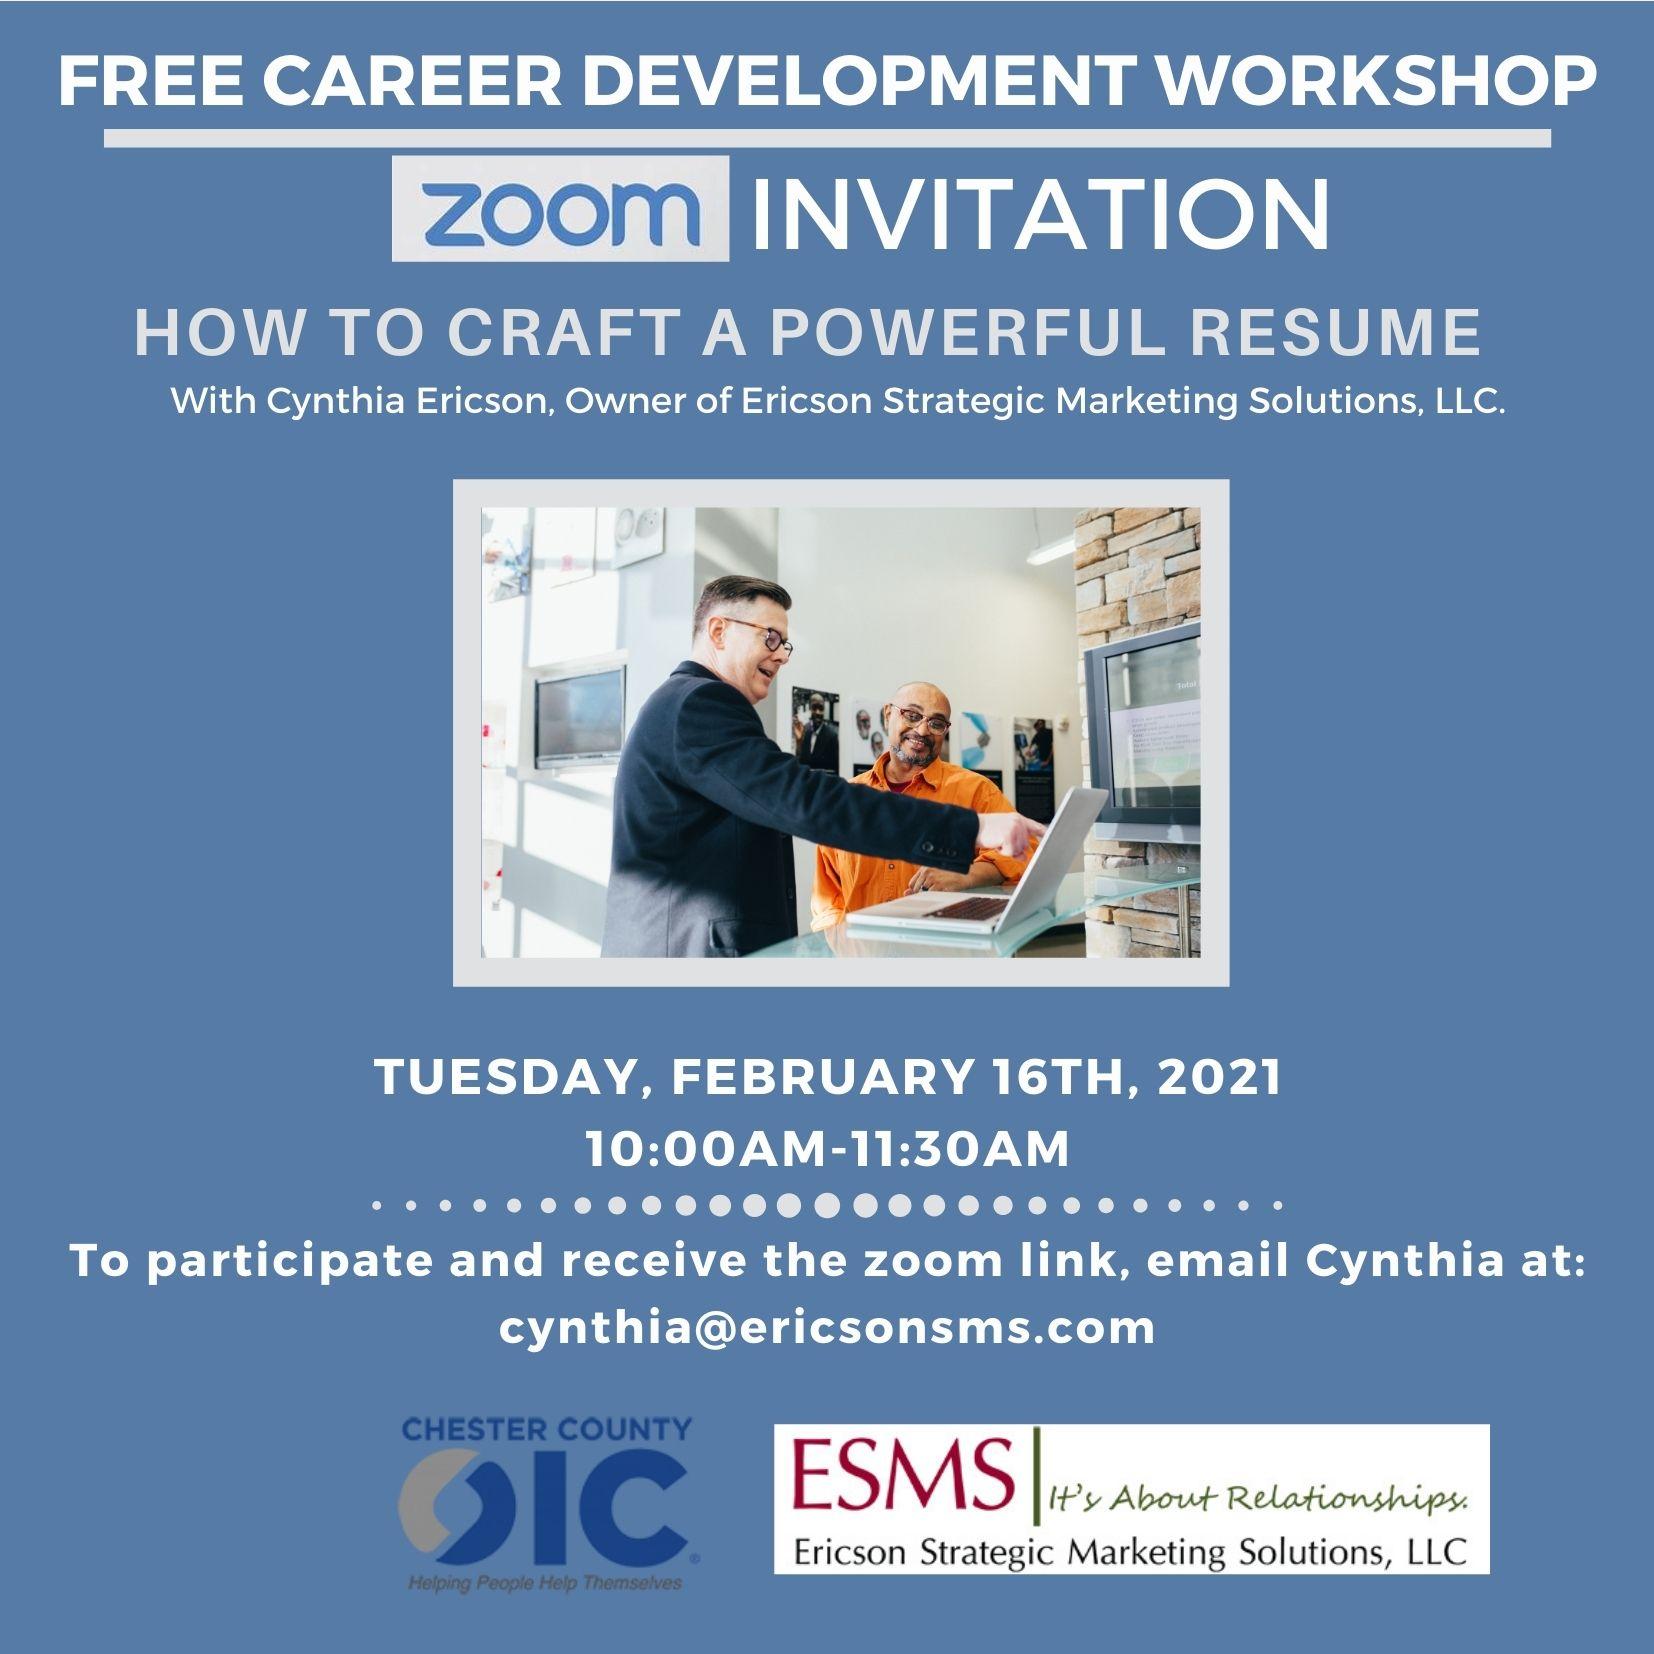 Free Career Development Workshops